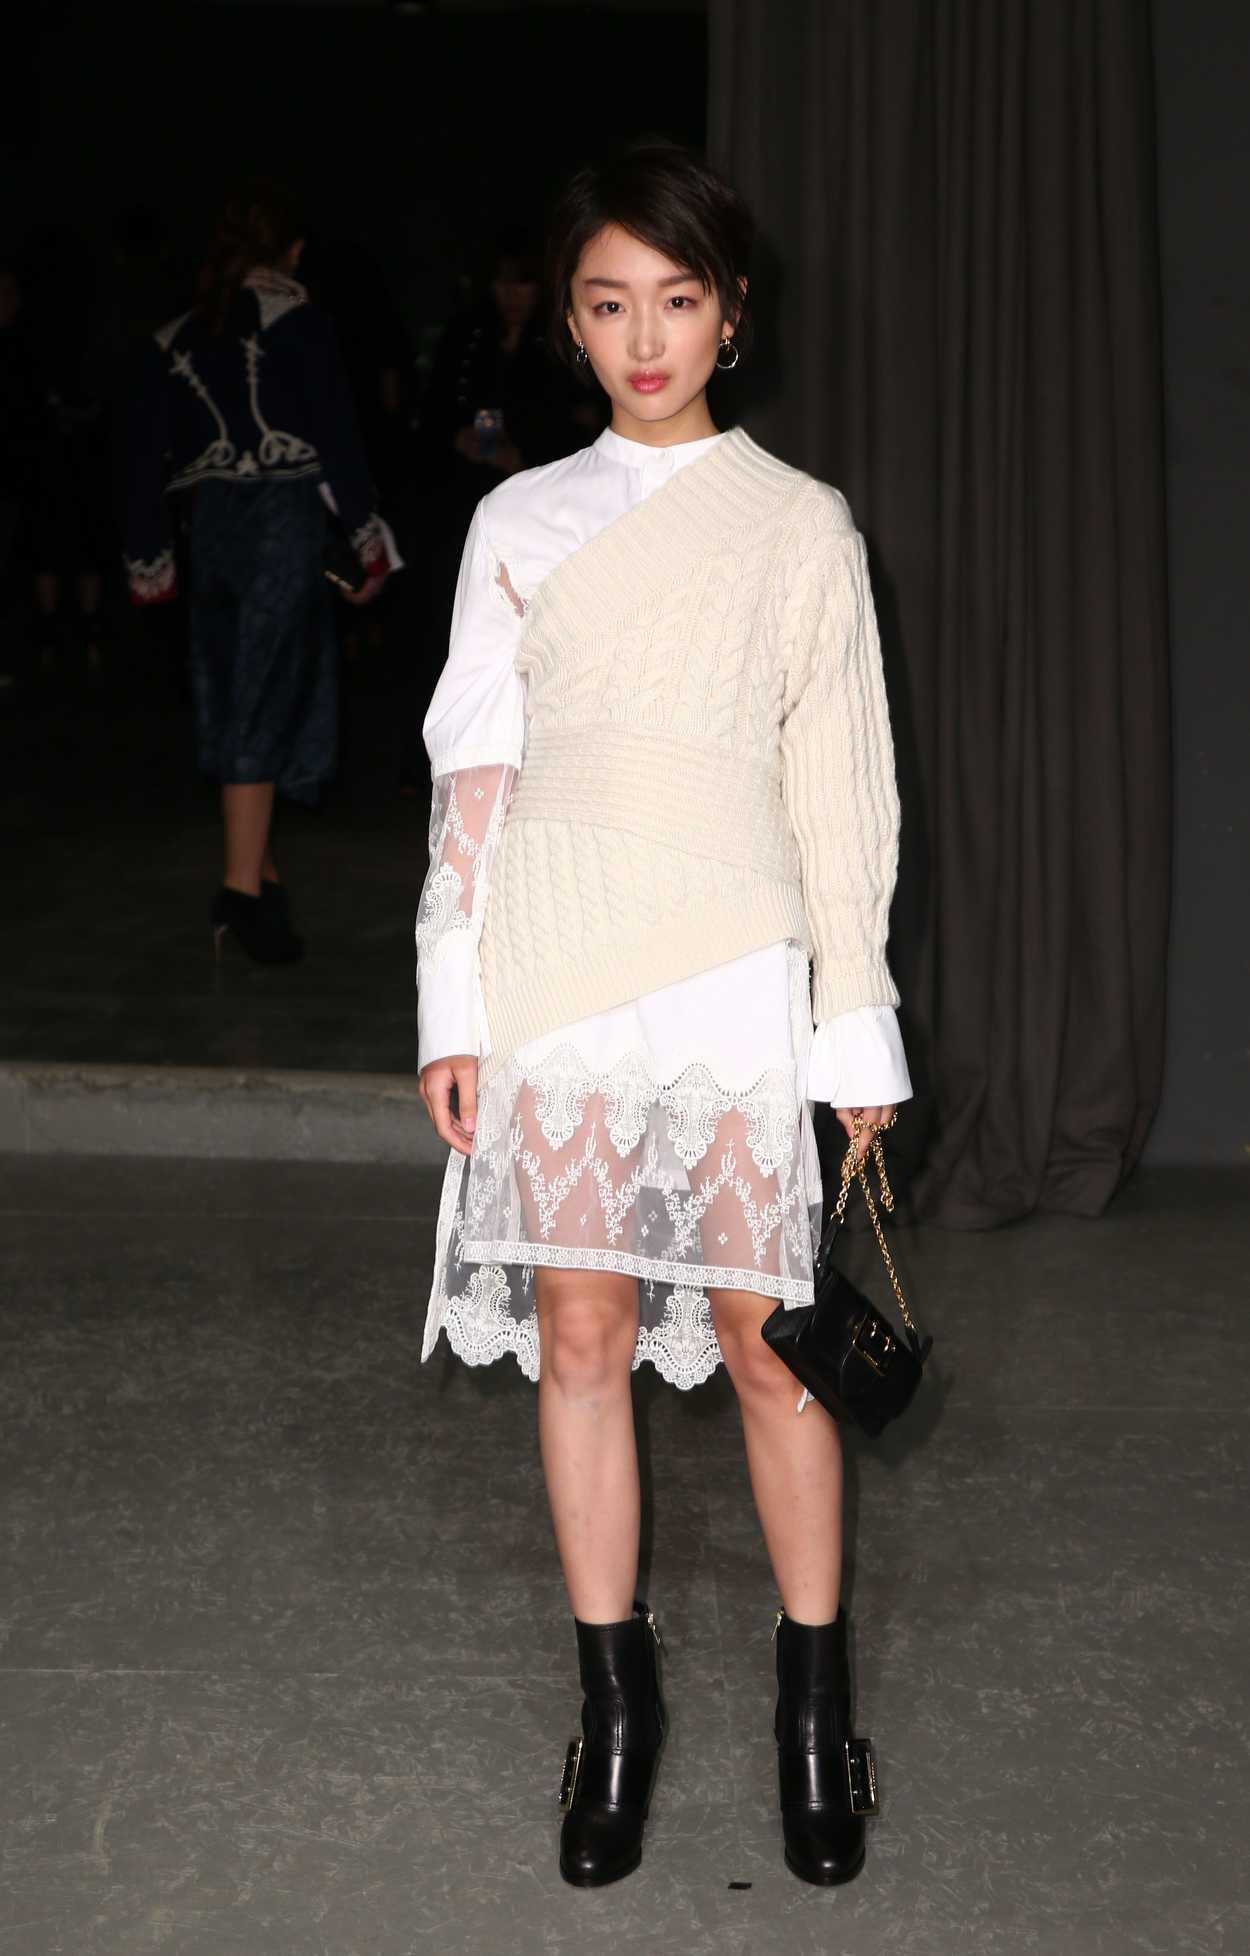 Zhou Dongyu At The Burberry Show During The London Fashion